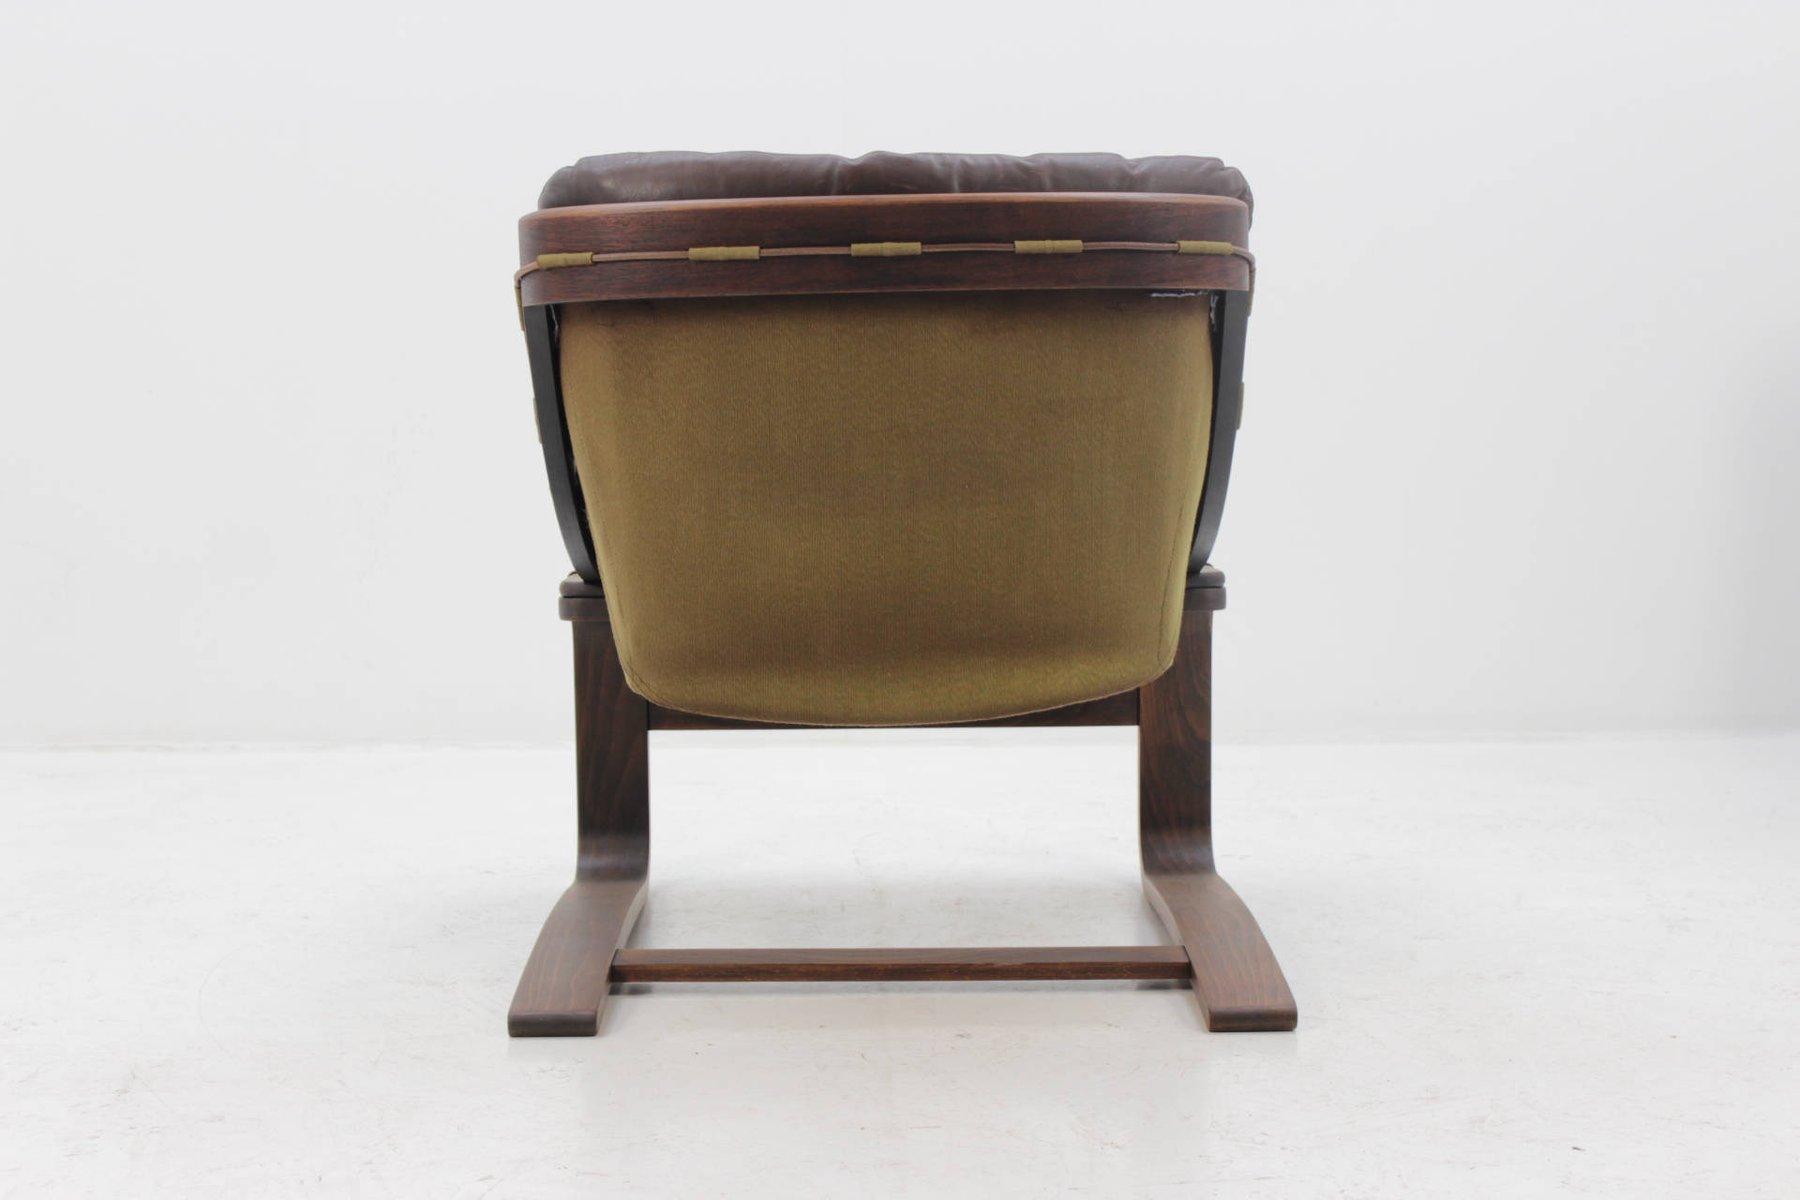 skandinavischer sessel aus bugholz und leder von ake. Black Bedroom Furniture Sets. Home Design Ideas